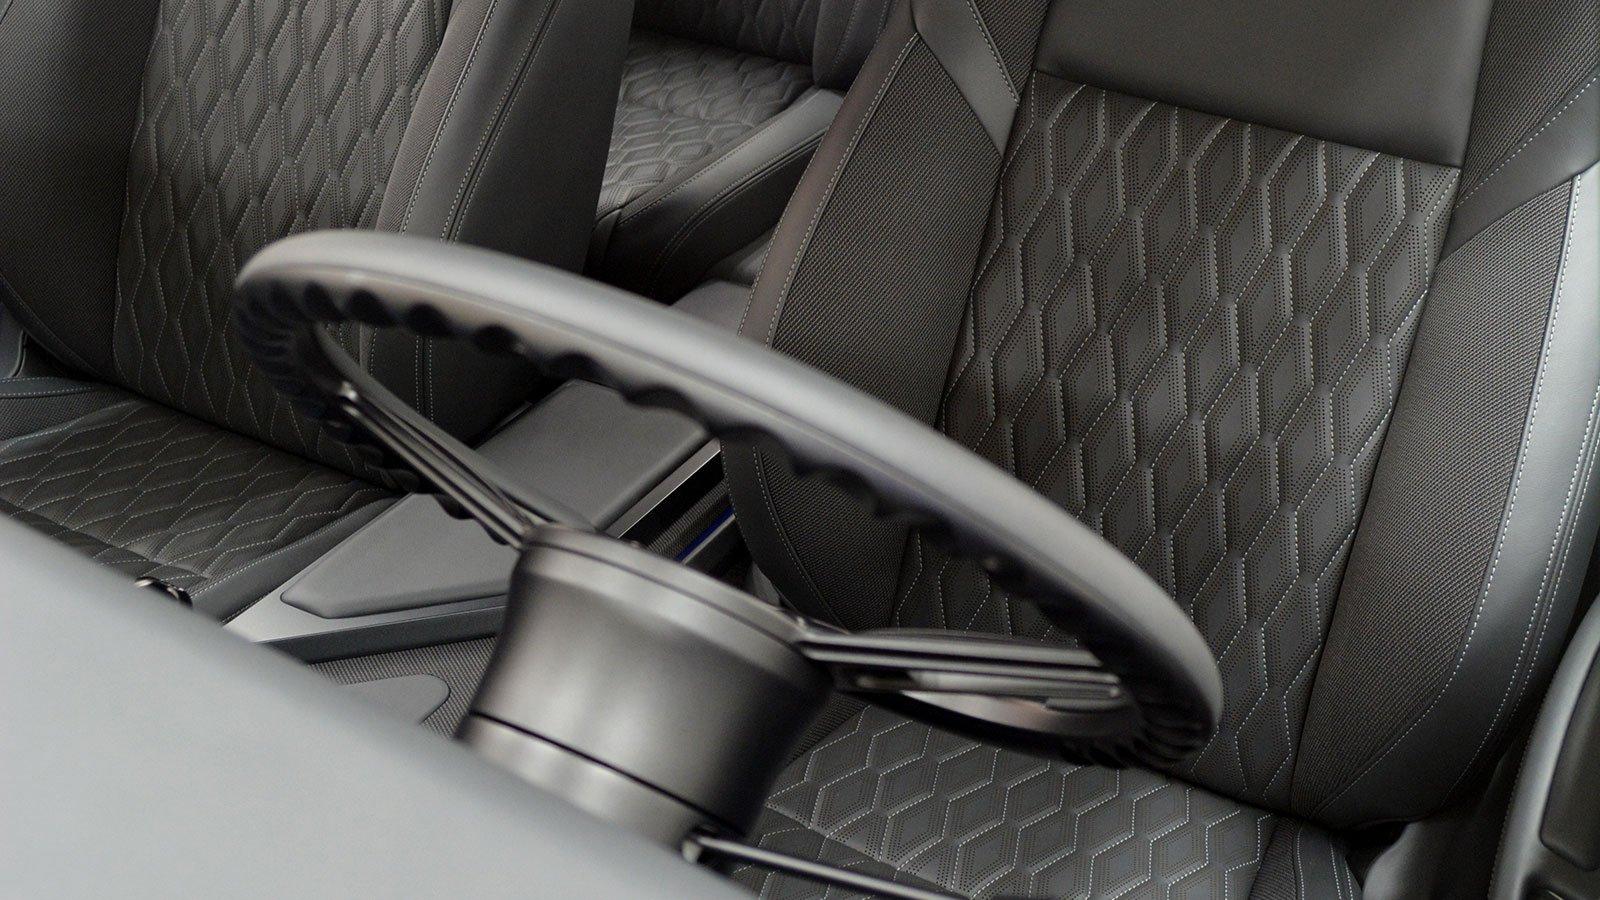 interior-seats-closeup